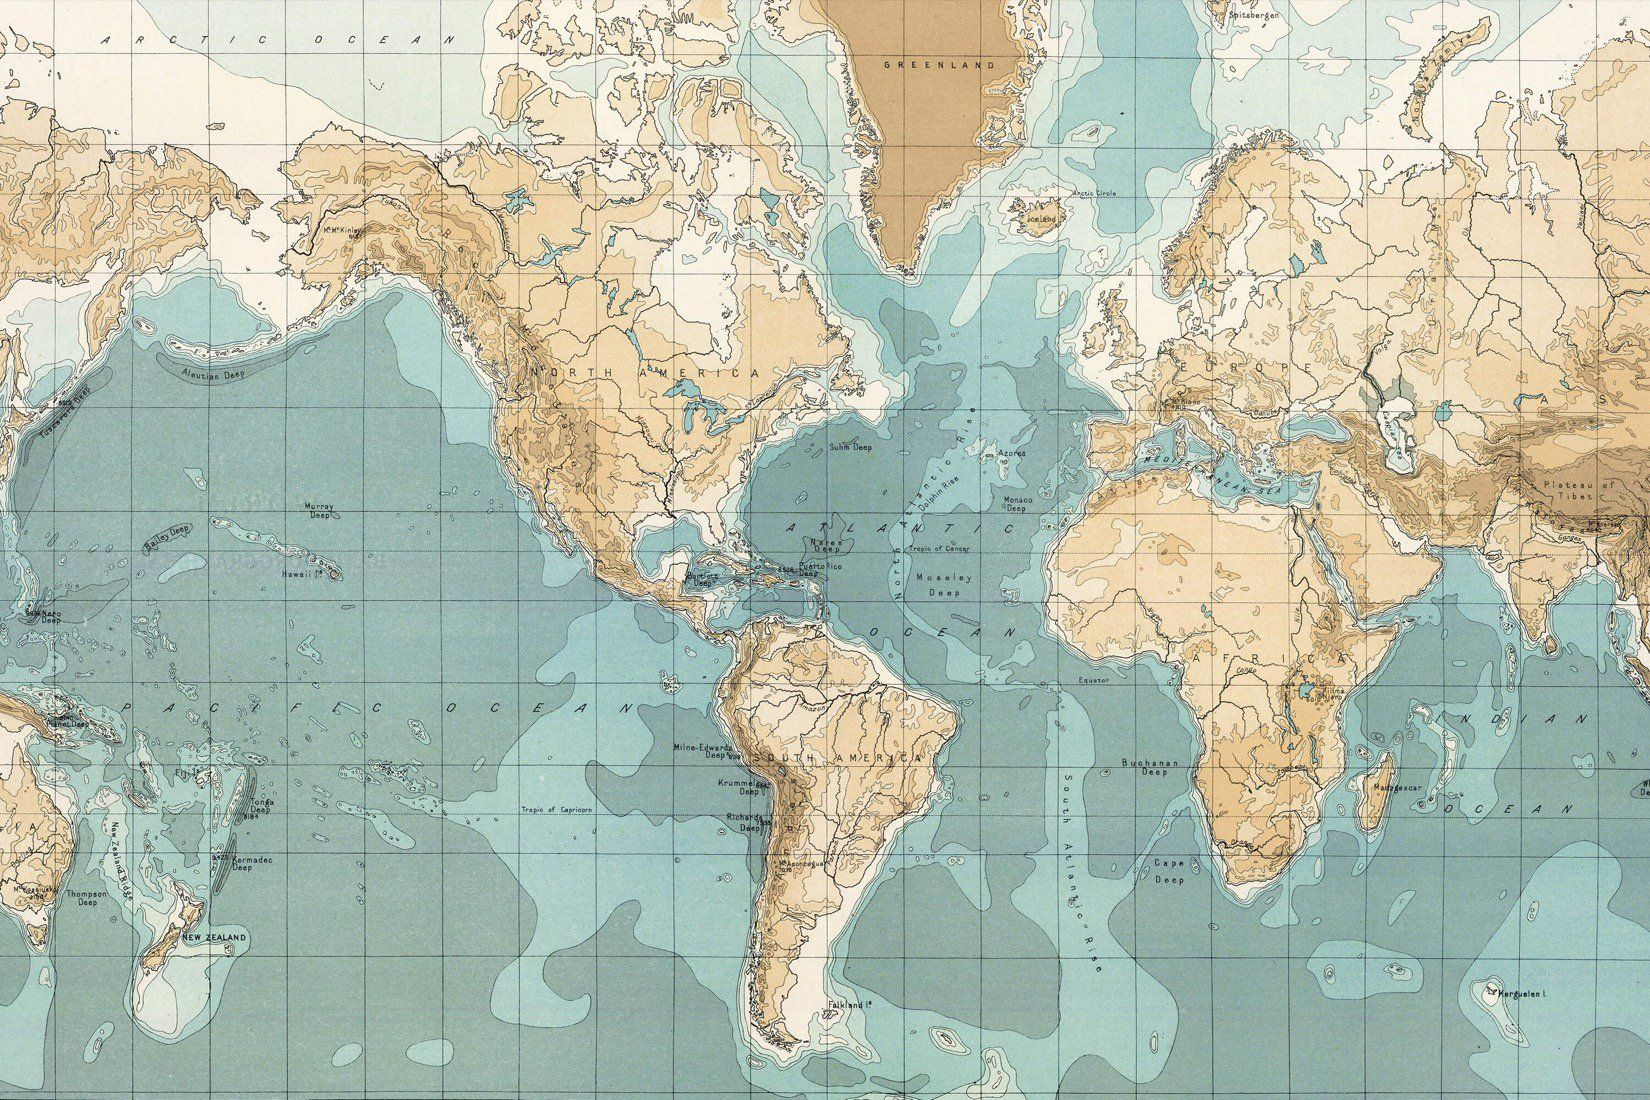 Vintage Nautical Map Wallpaper Vintage Map Mural Muralswallpaper Map Wallpaper Color World Map Vintage Maps